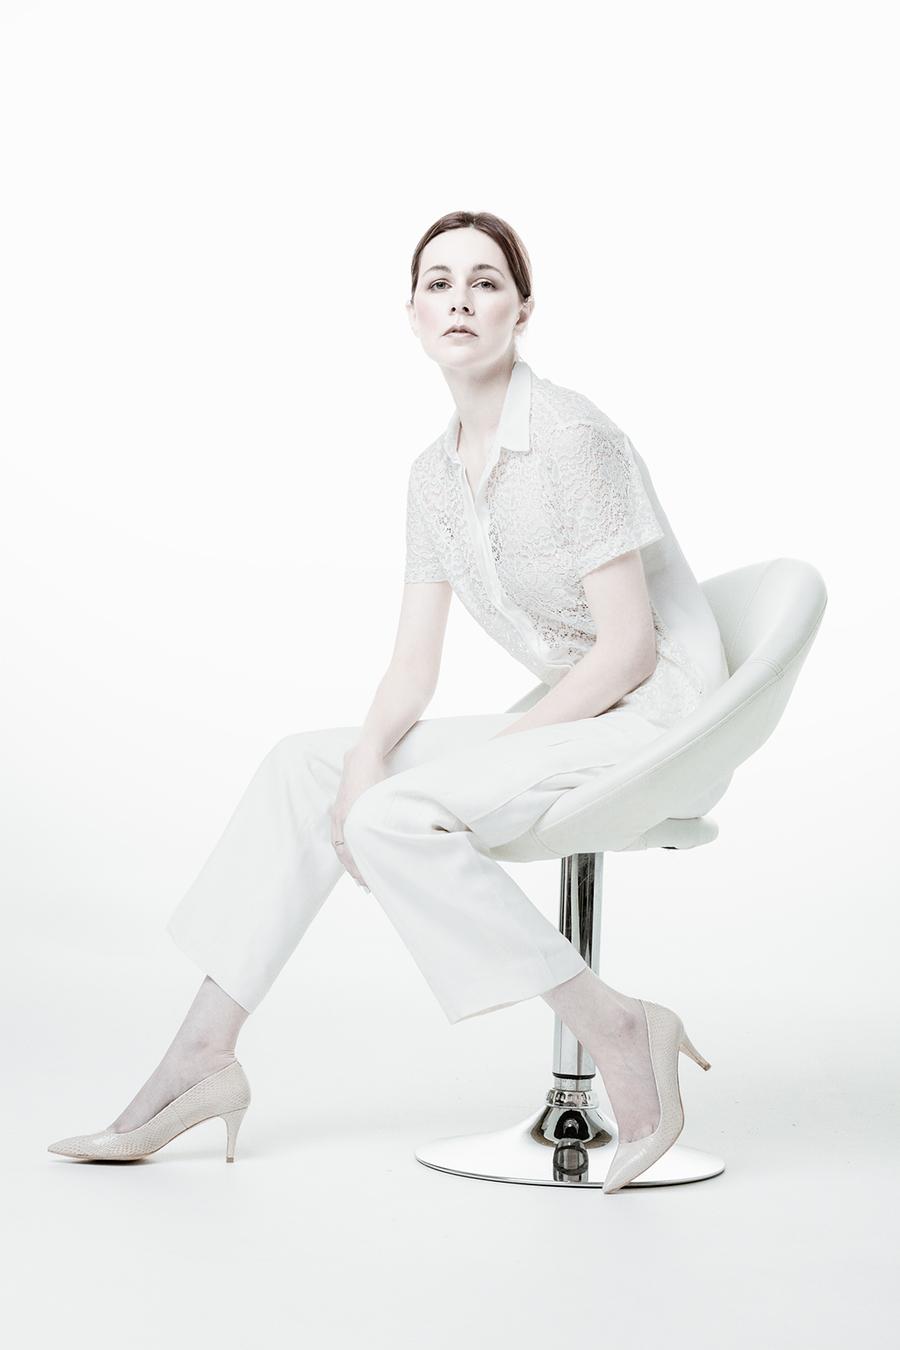 White / Photography by Grewy, Model Atalanta, Post processing by Grewy, Stylist Atalanta, Taken at AURA Studio / Uploaded 16th September 2019 @ 12:39 PM